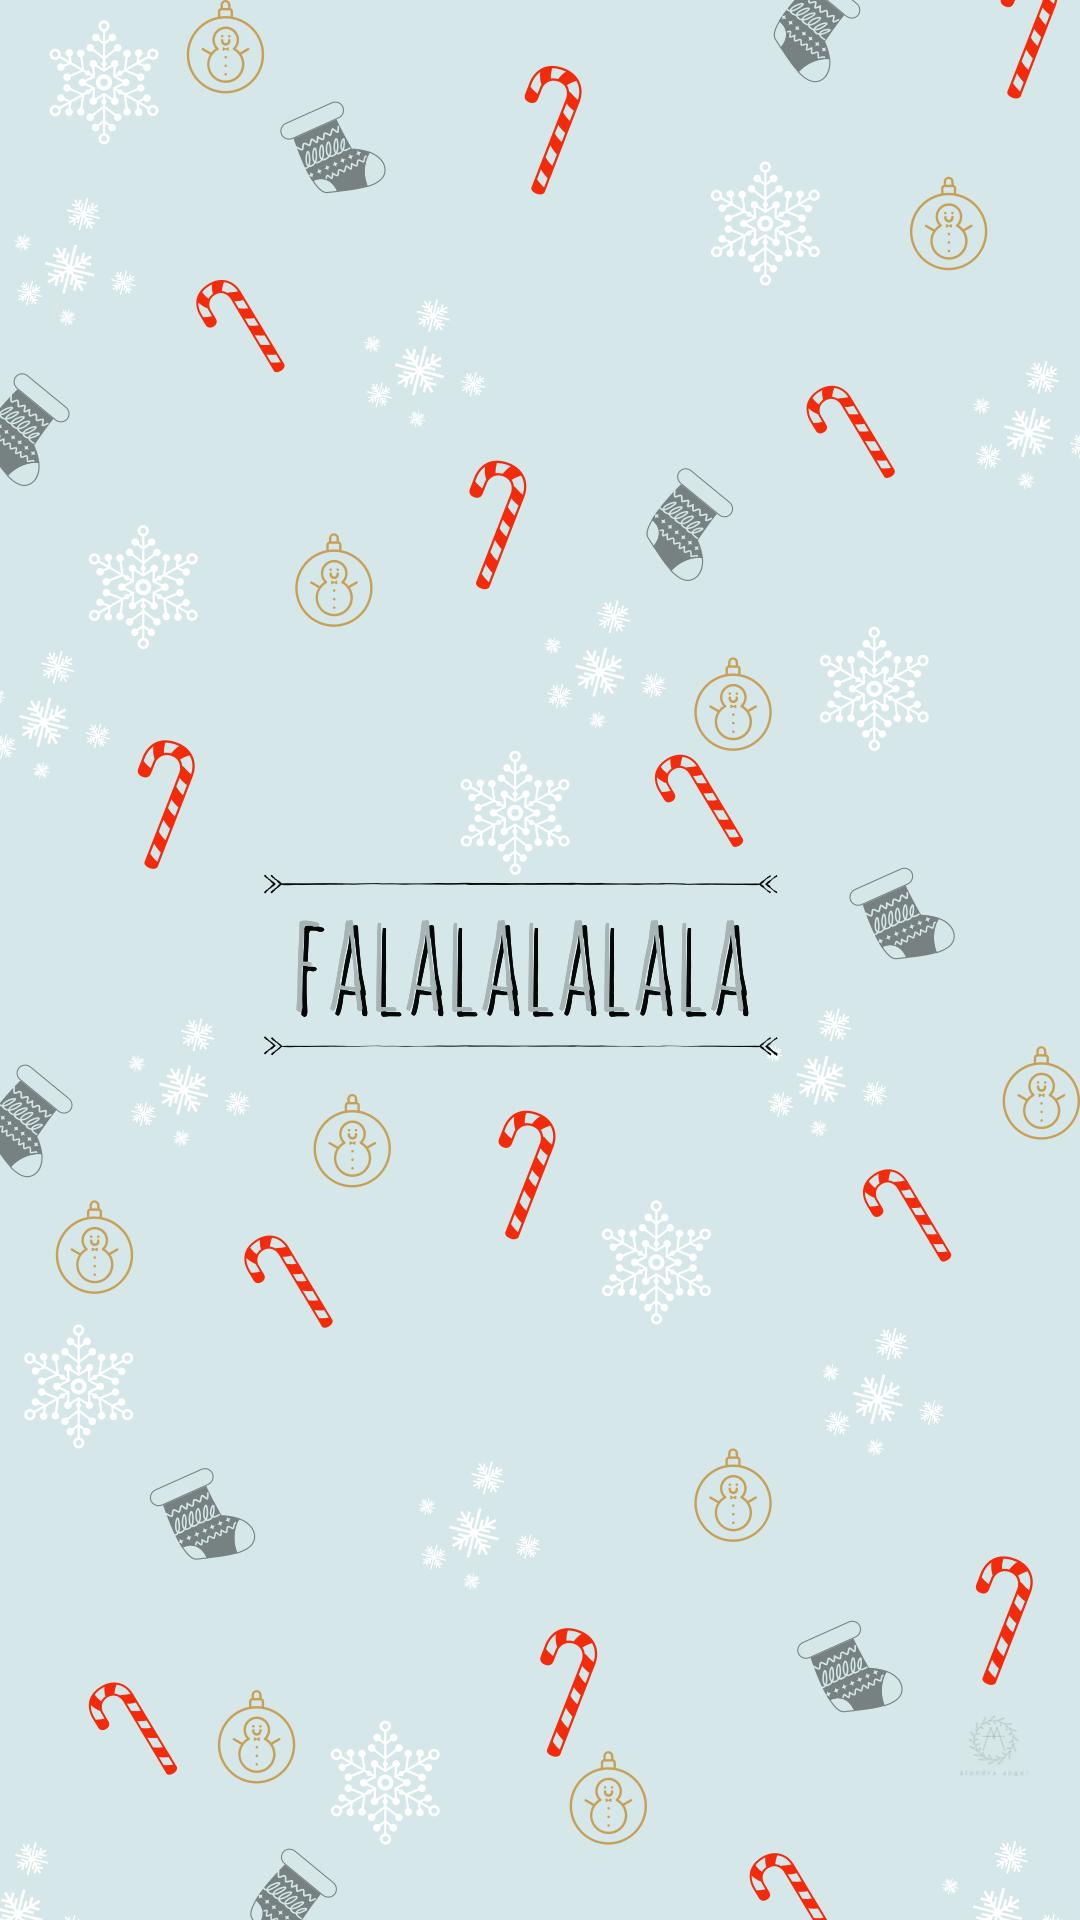 Free Smartphone Wallpapers Christmaswallpaperiphone Wallpapers Wallpap Christmas Wallpaper Iphone Cute Wallpaper Iphone Christmas Christmas Phone Wallpaper